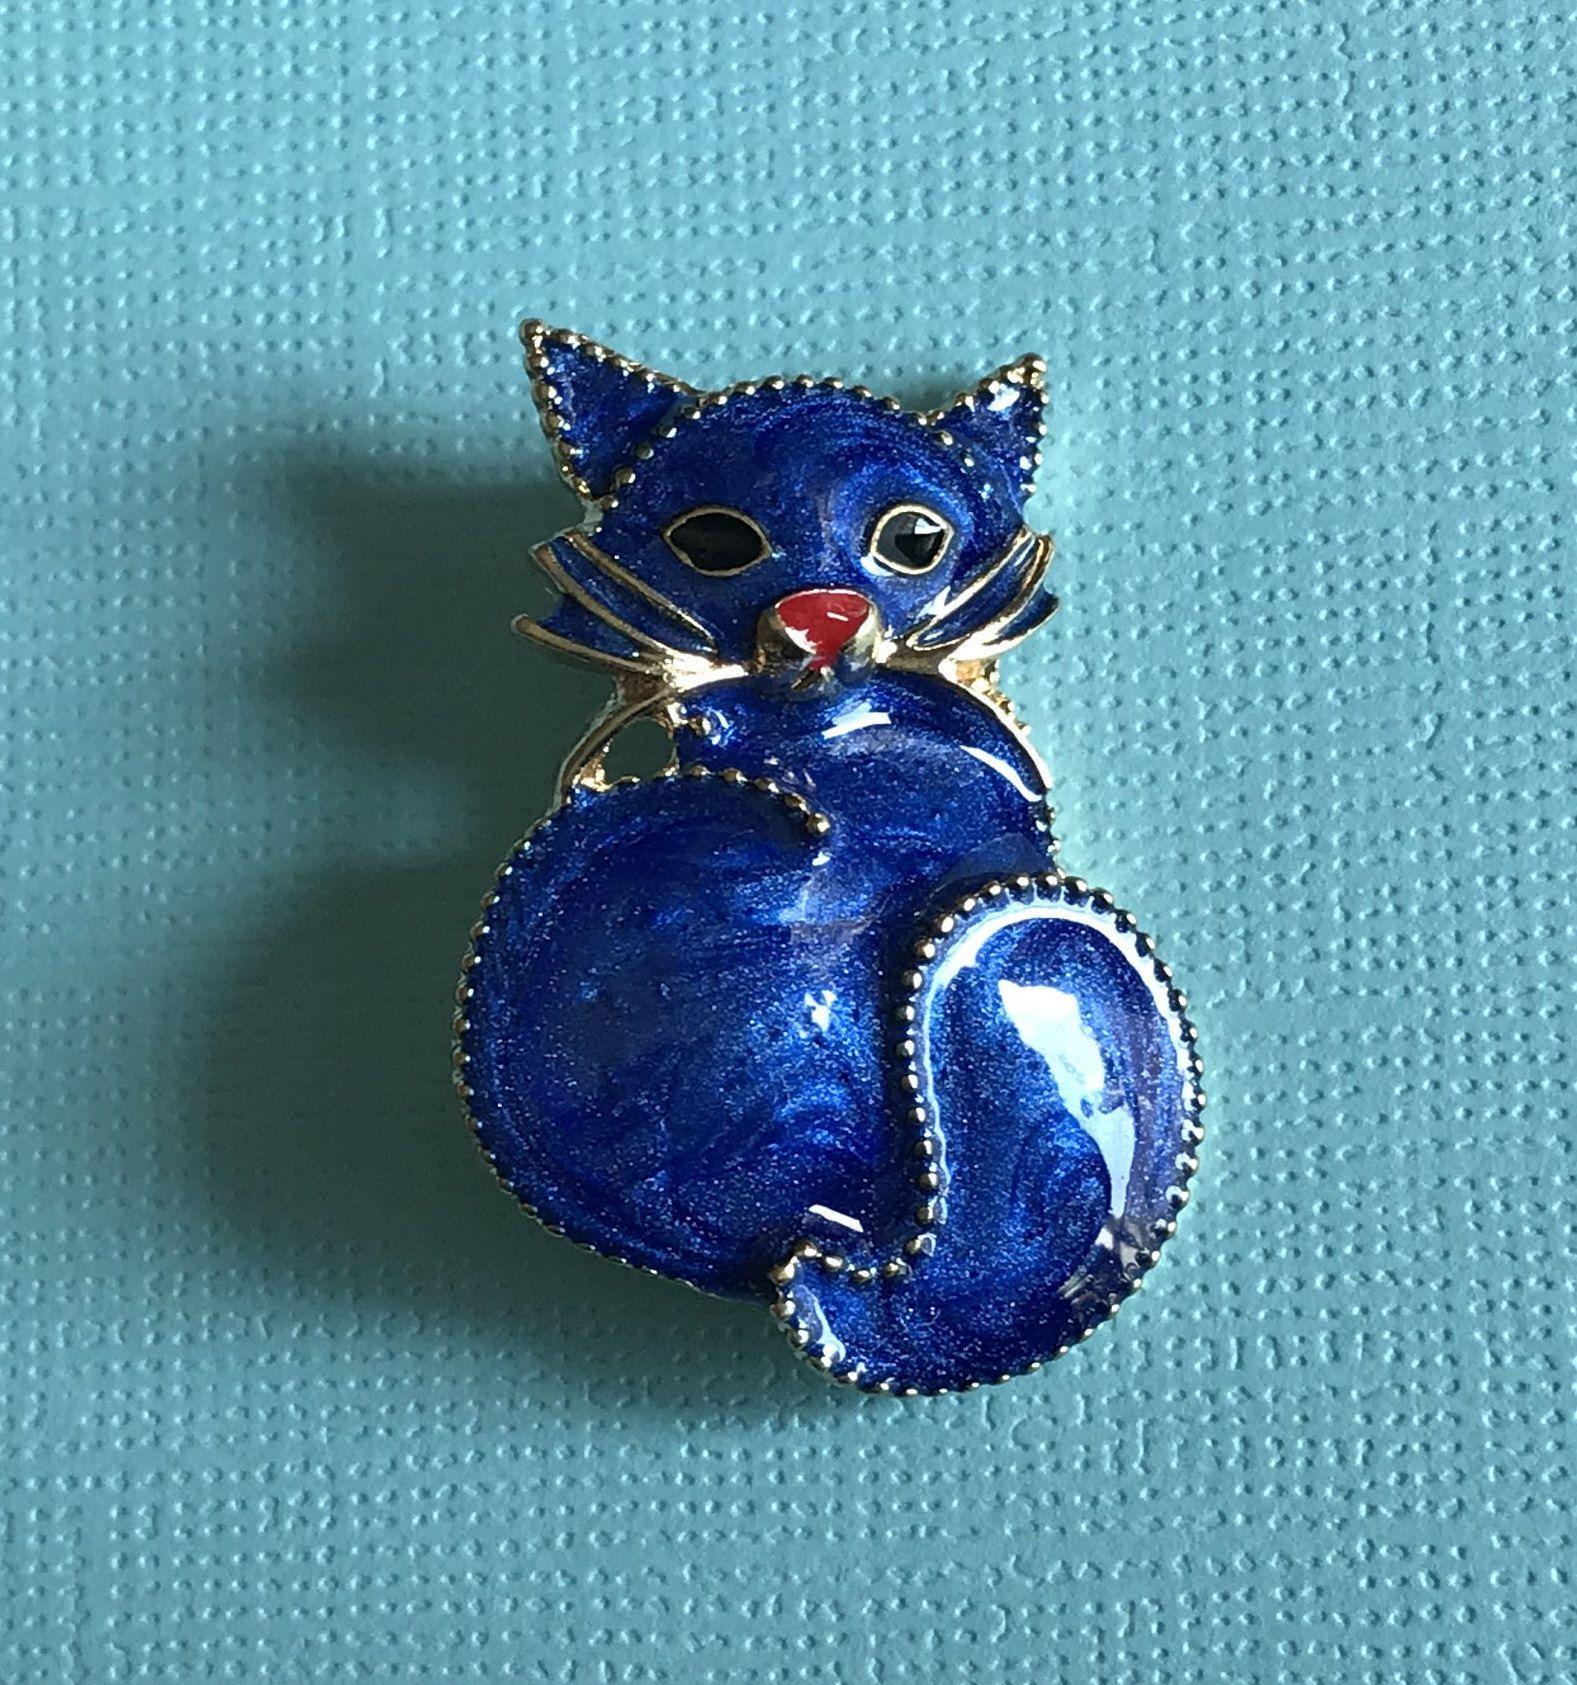 Blue Cat Brooch Blue Cat Pin Cat Jewelry Cat Rescue Cat Adoption Cat Brooch Cat Jewelry Vintage Cat Brooch